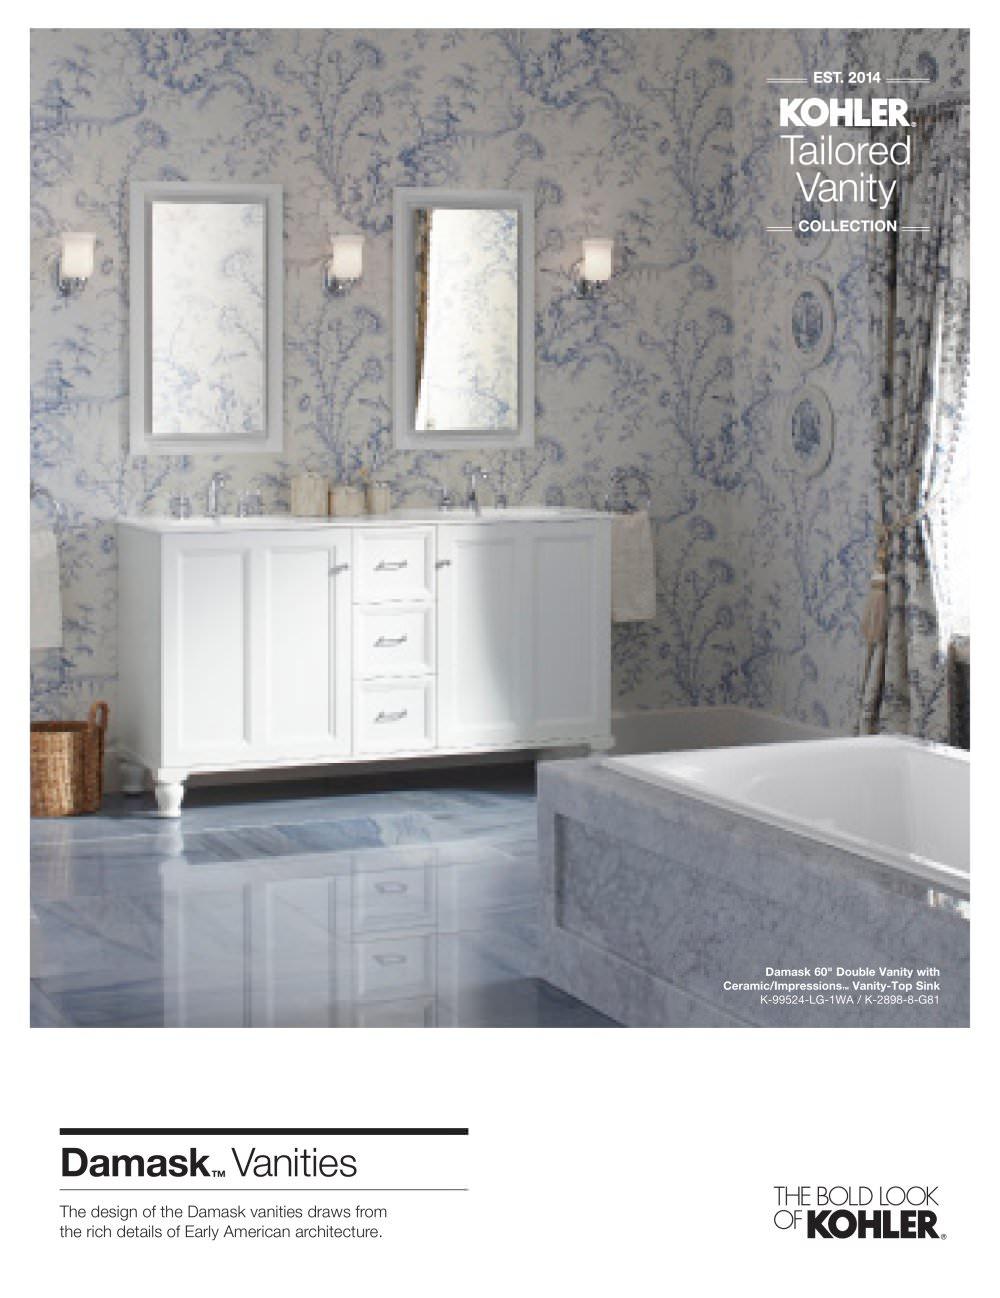 tailored vanity damask 1 4 pages - Kohler Vanity